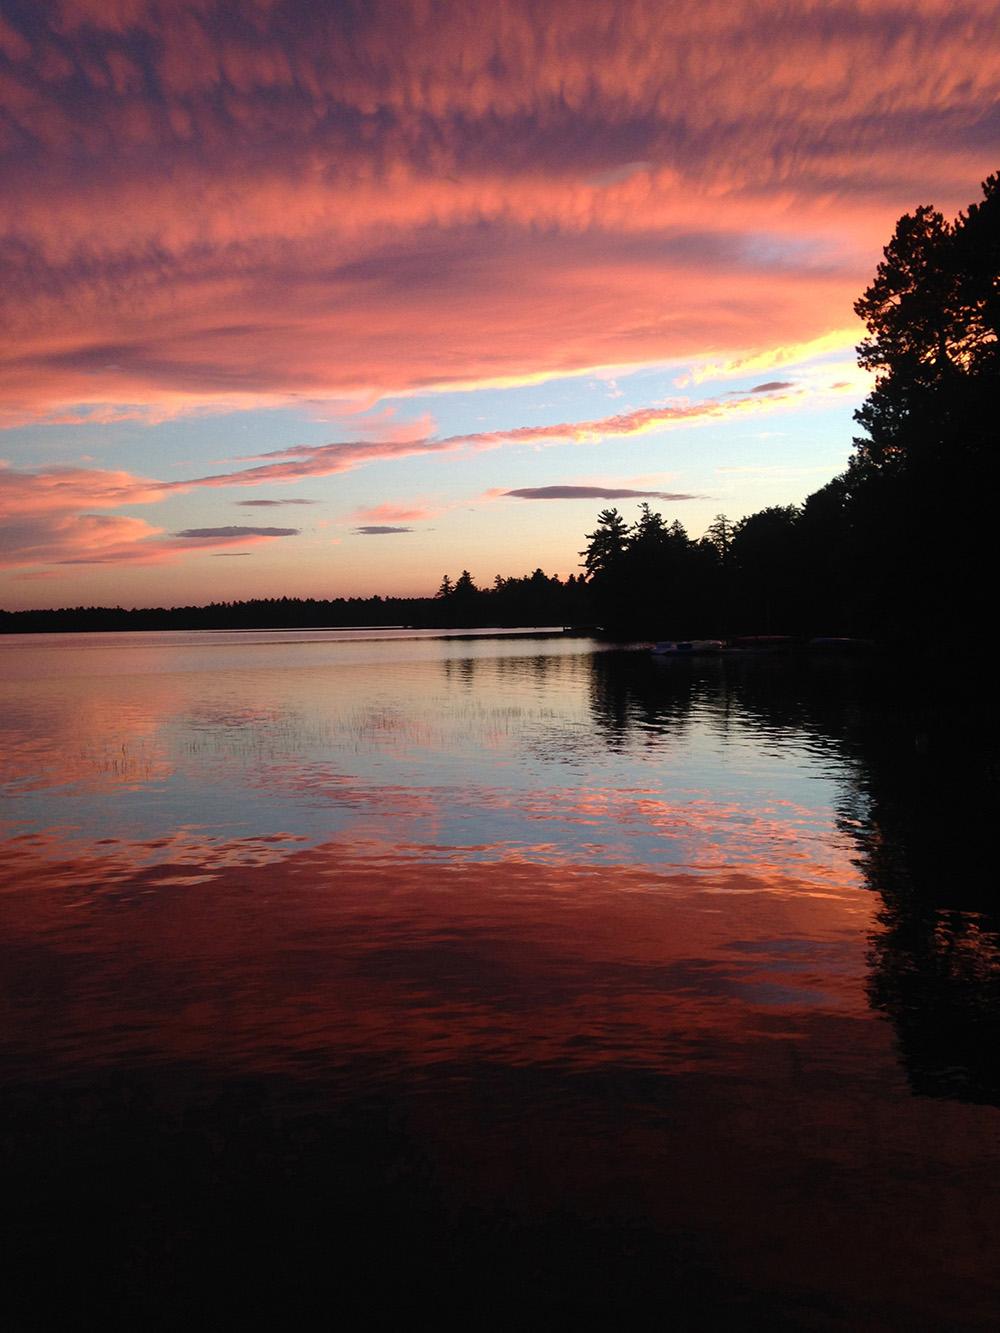 """Little Lake Sunapee Sunset"" Elizabeth"